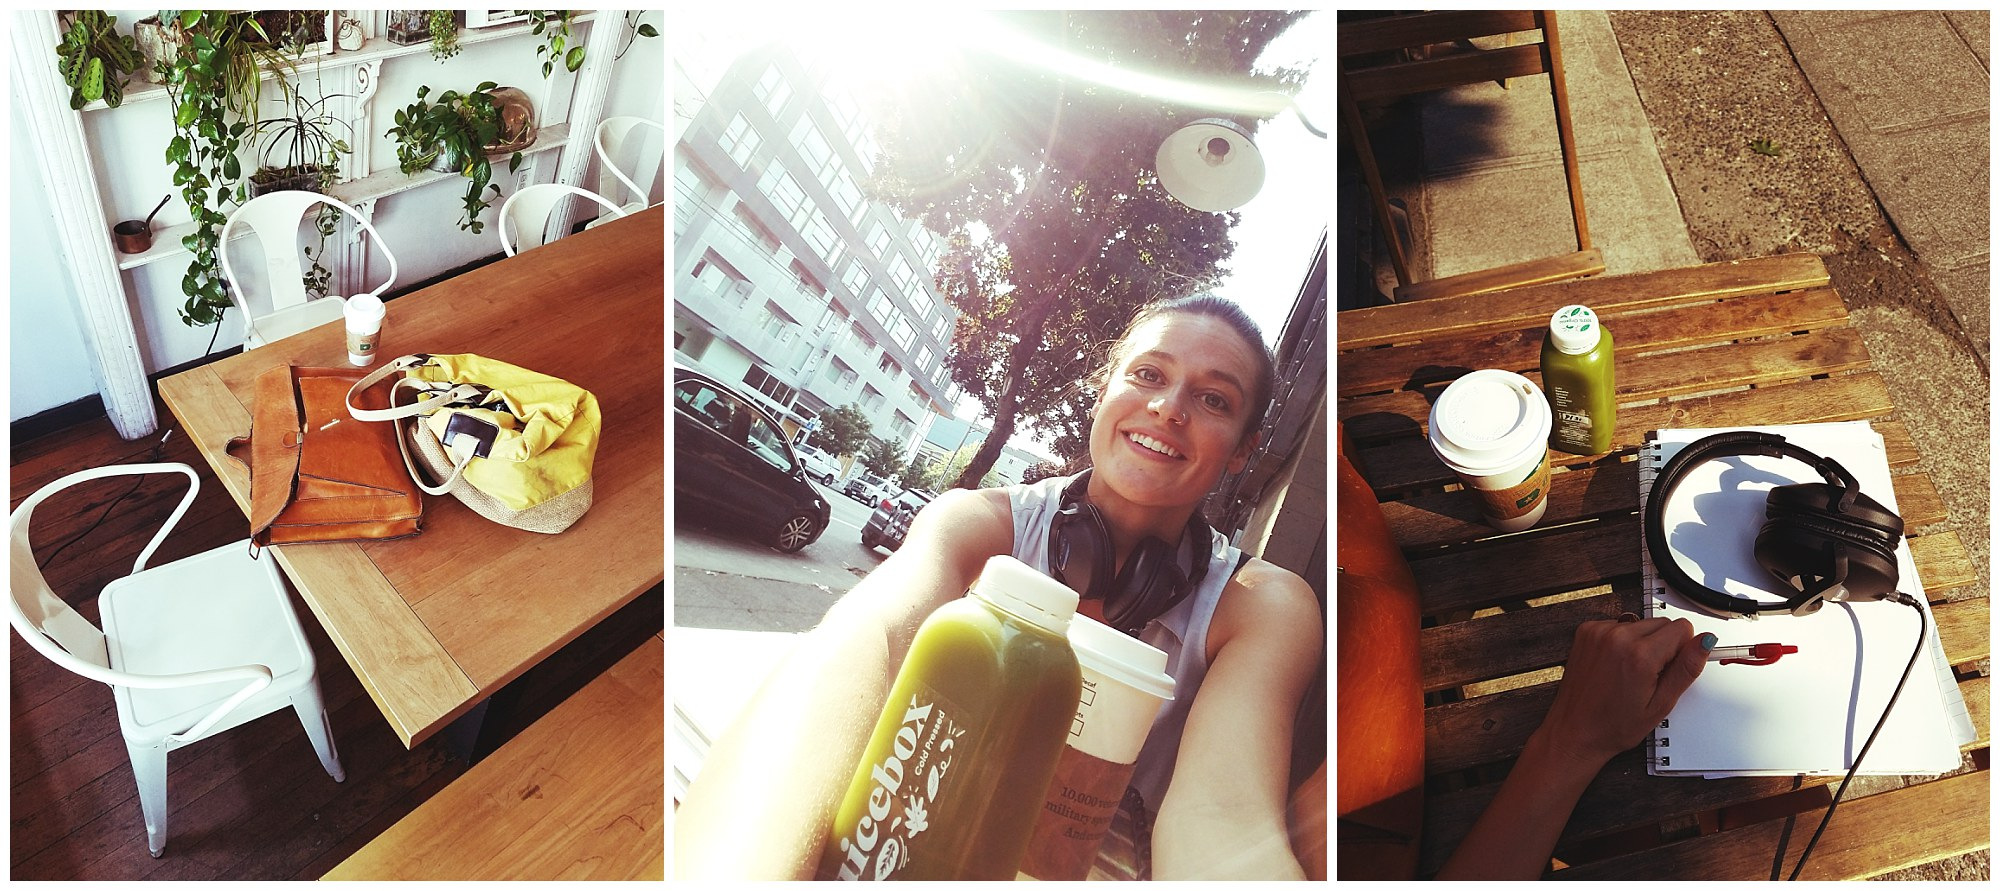 cha wilde - juicebox cafe seattle